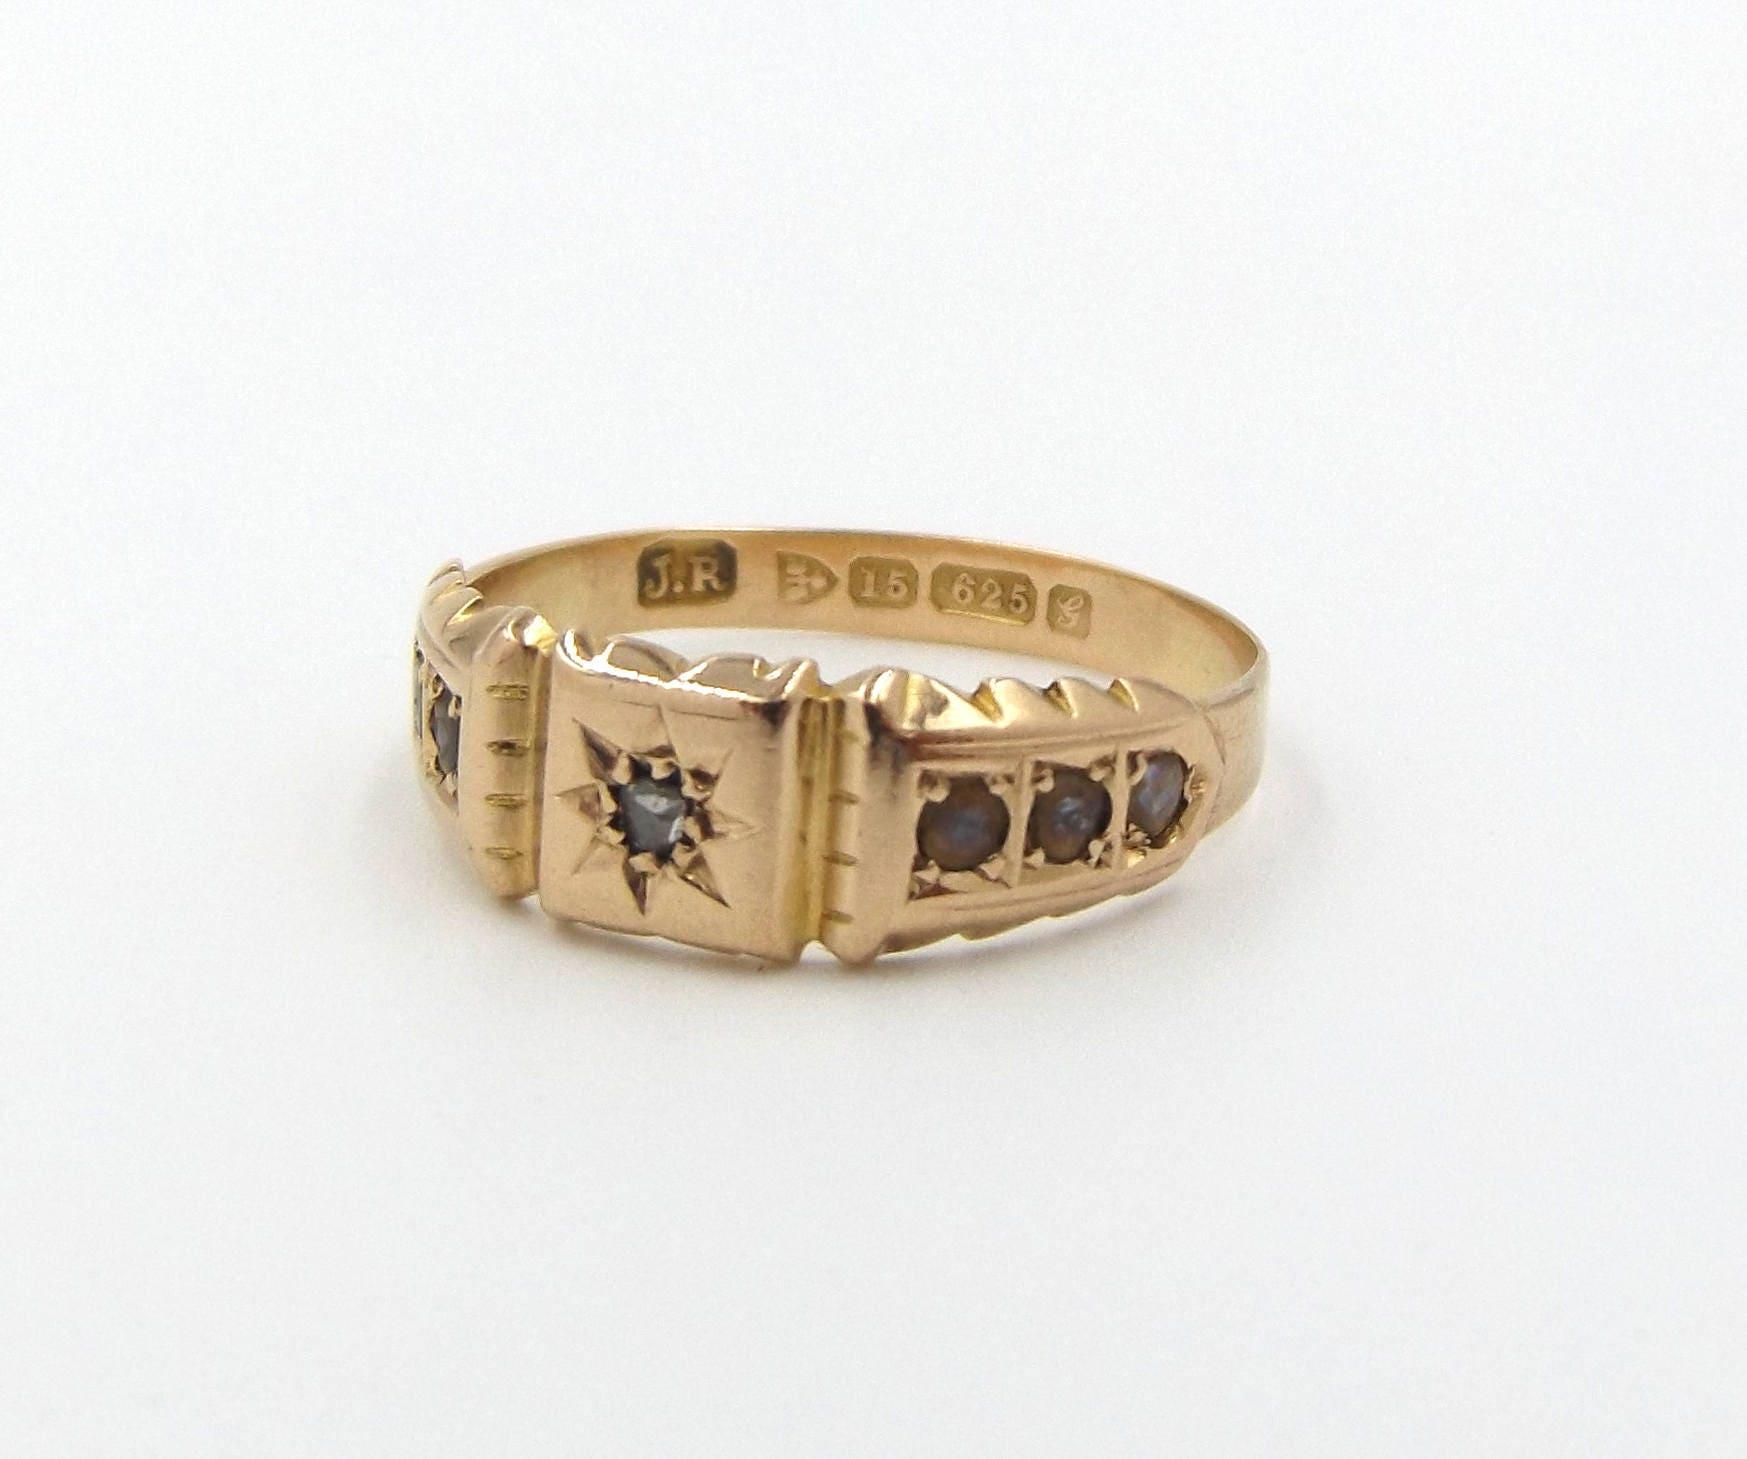 Antique 15ct Gold Diamond  Pearl Ring  15k Edwardian Signet Ring  UK size P  US size 7 12